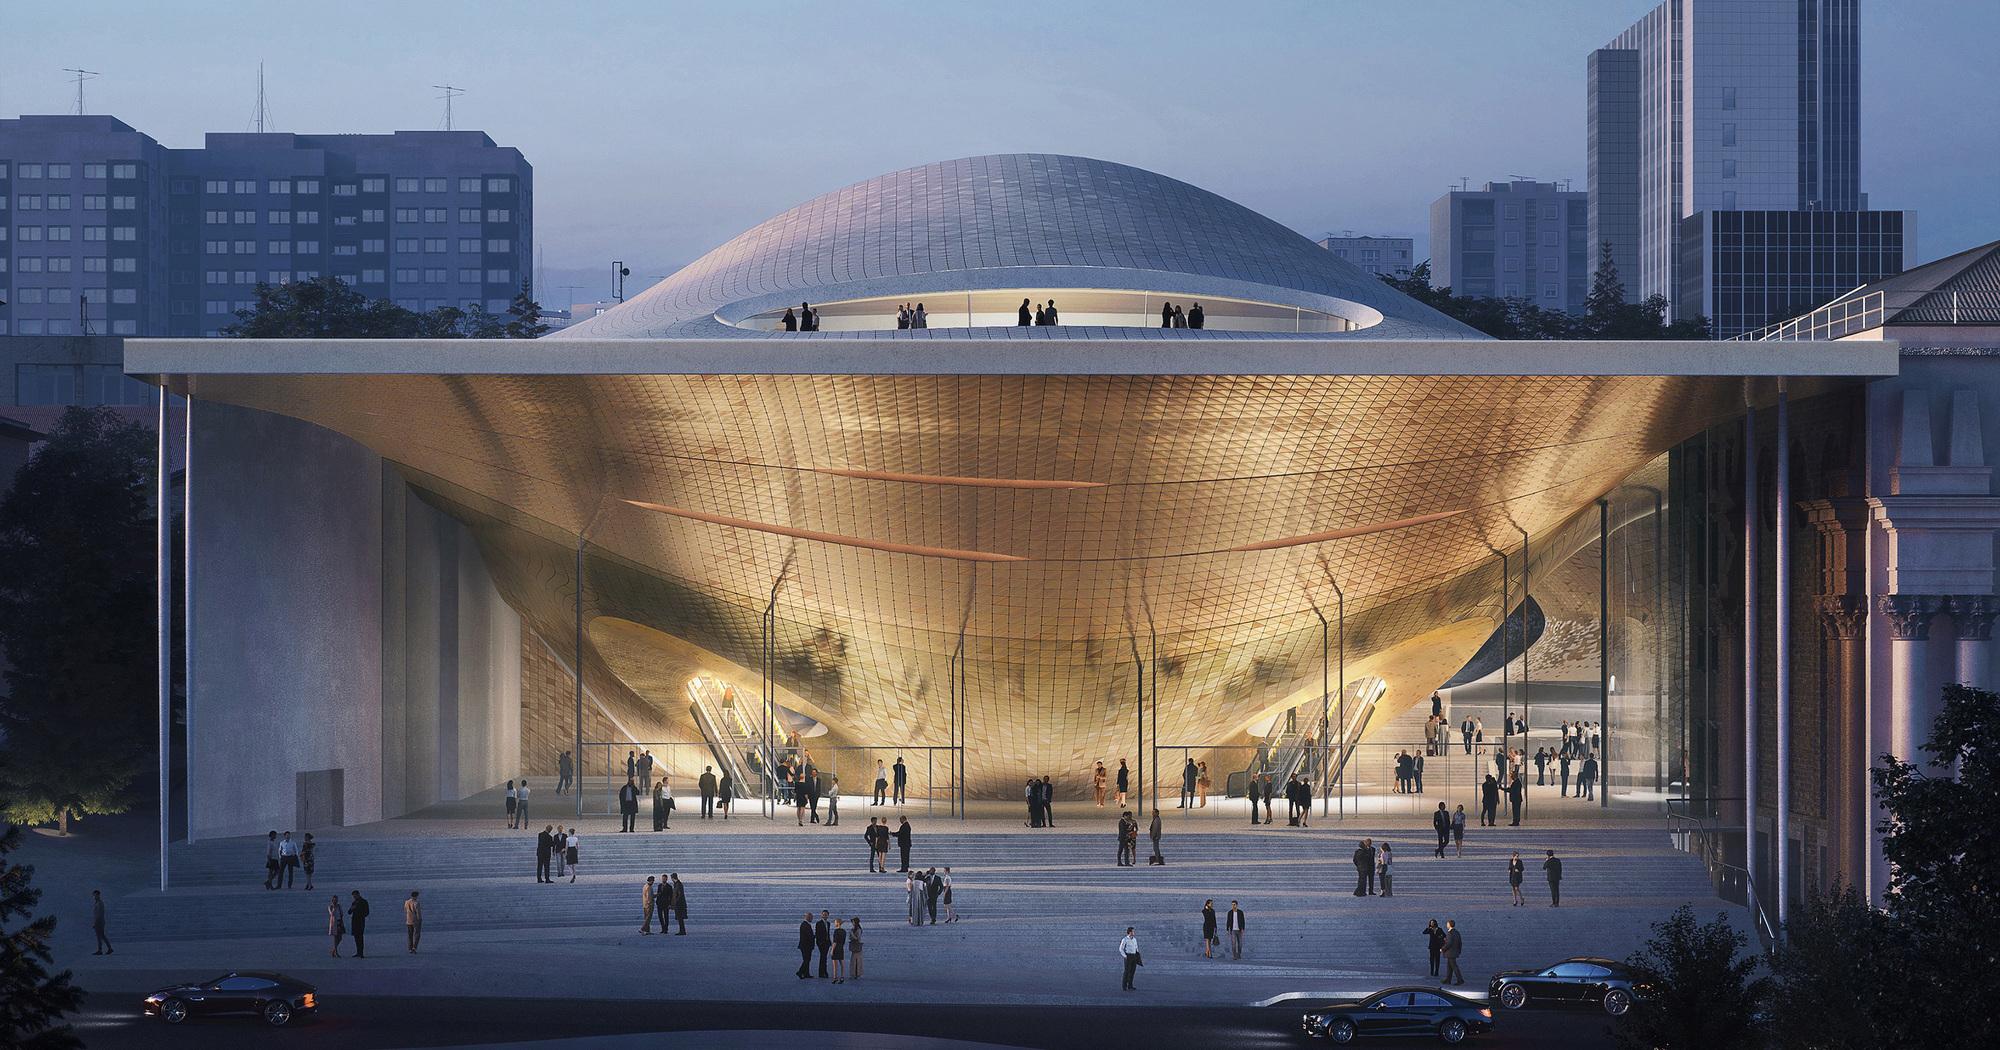 Zaha Hadid Architects Reinterprets Sound Waves for the Sverdlovsk Philharmonic Concert Hall